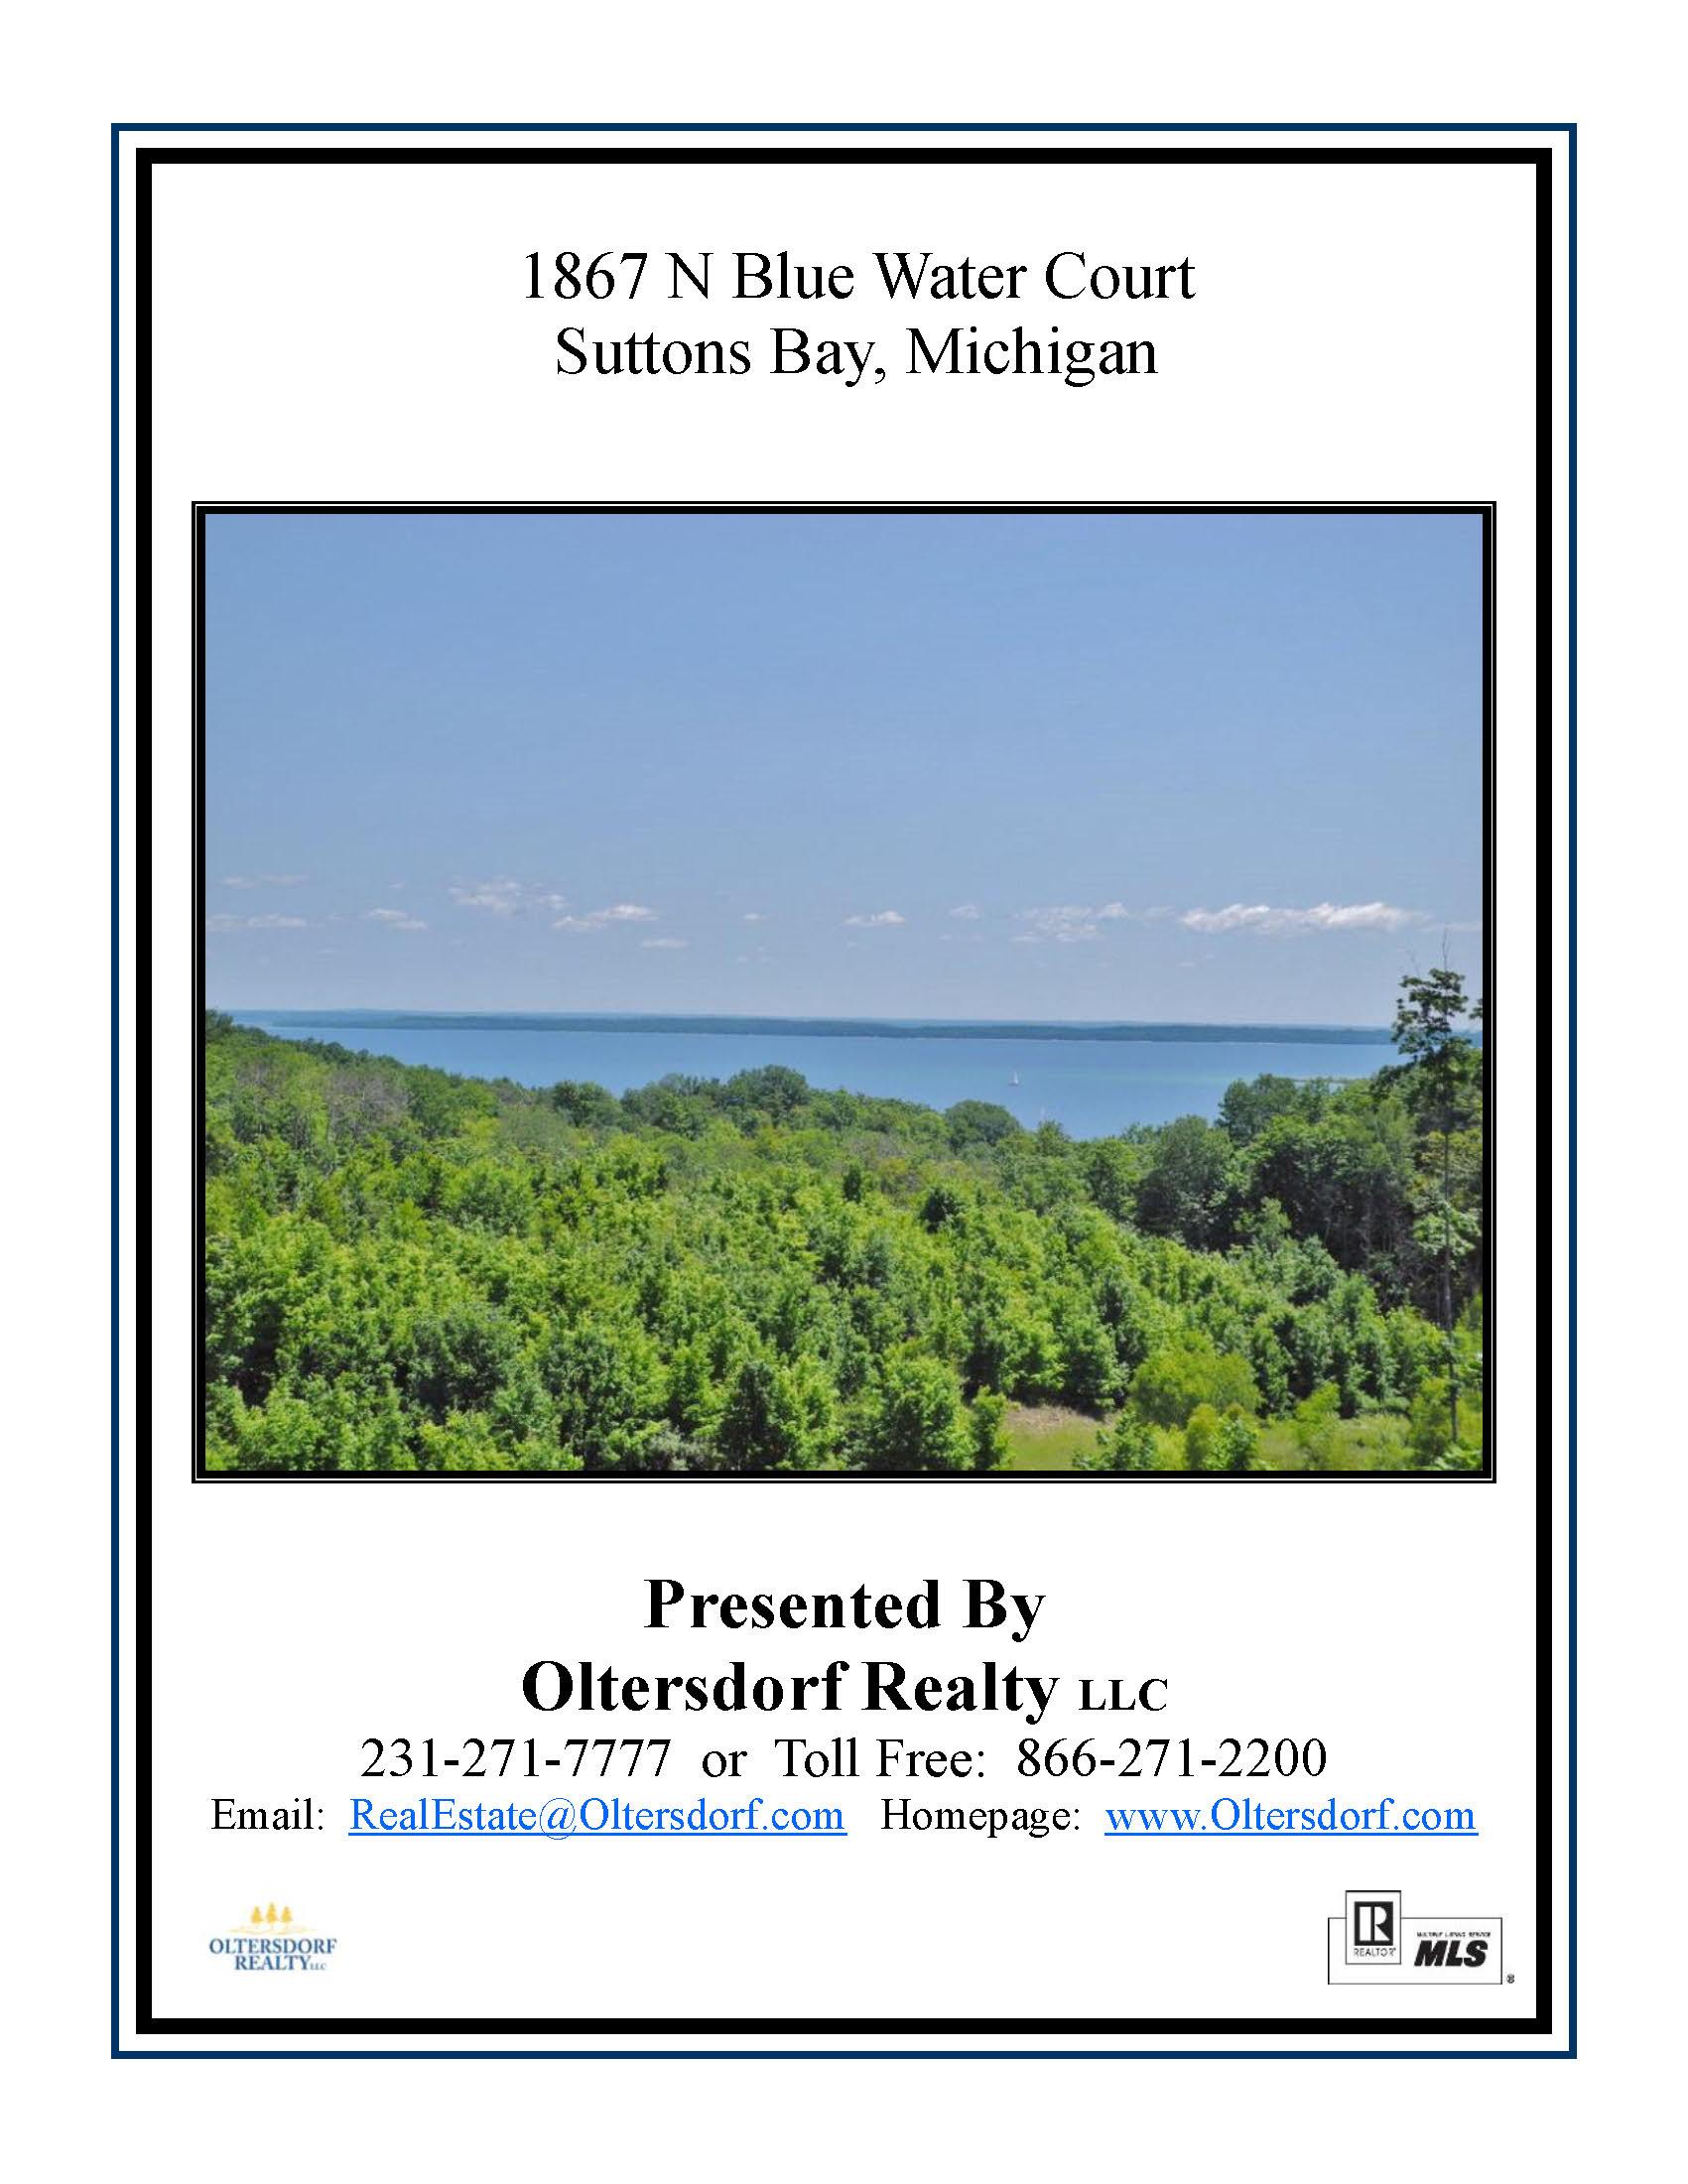 1867 N Blue Water Ct, Suttons Bay, Oltersdorf Realty Marketing Packet (1).jpg